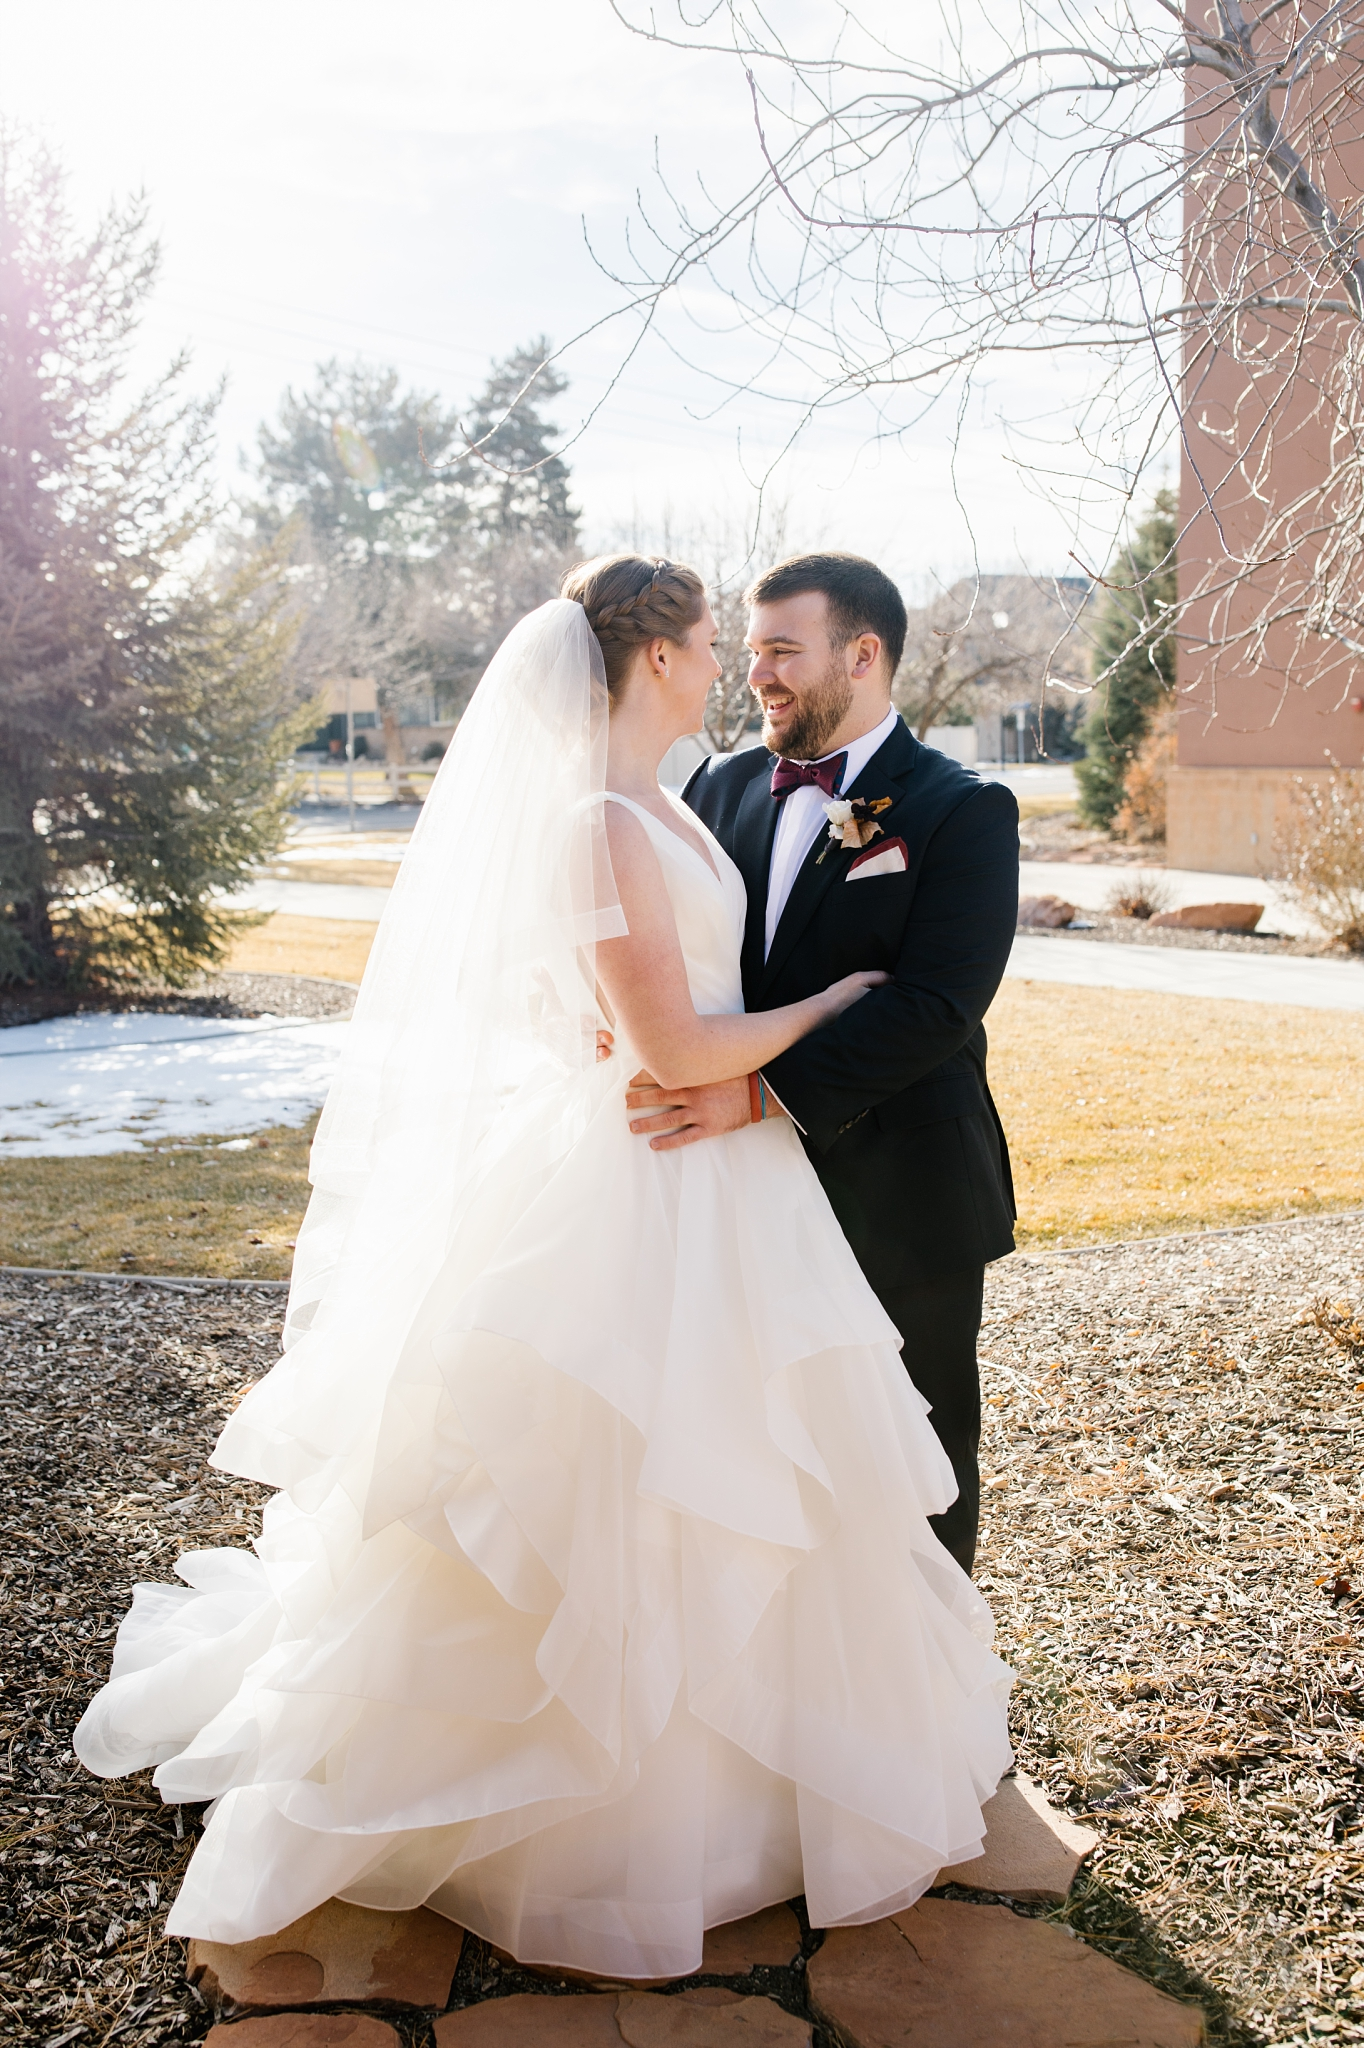 CN-Wedding-40_Lizzie-B-Imagery-Utah-Wedding-Photographer-Blessed-Sacrament-Catholic-Church-Sandy-Utah-The-Blended-Table-Salt-Lake-City.jpg